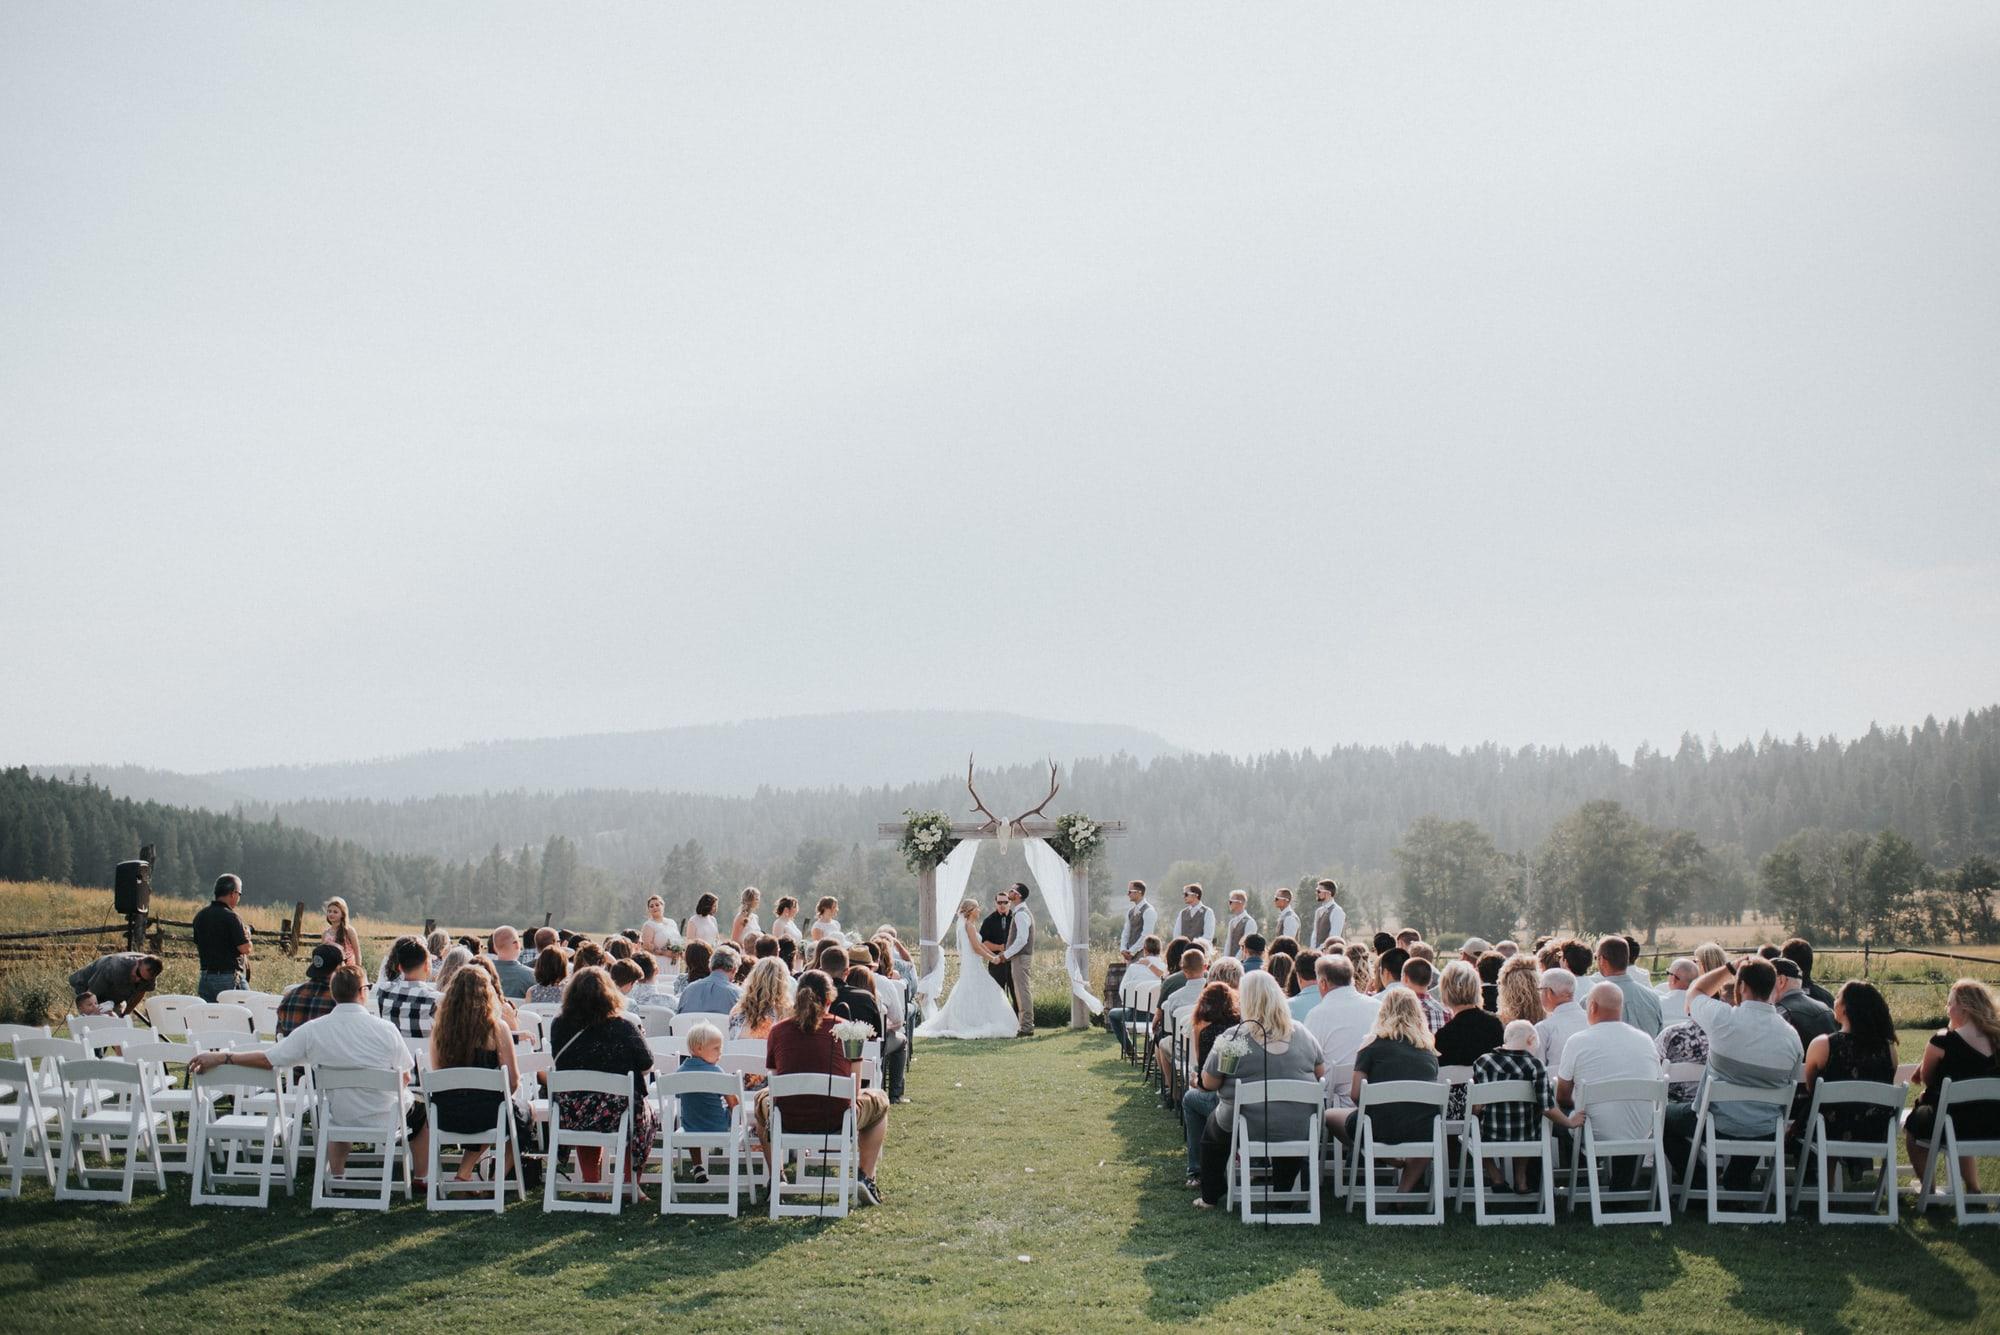 outdoor wedding ceremony in cle elum washington